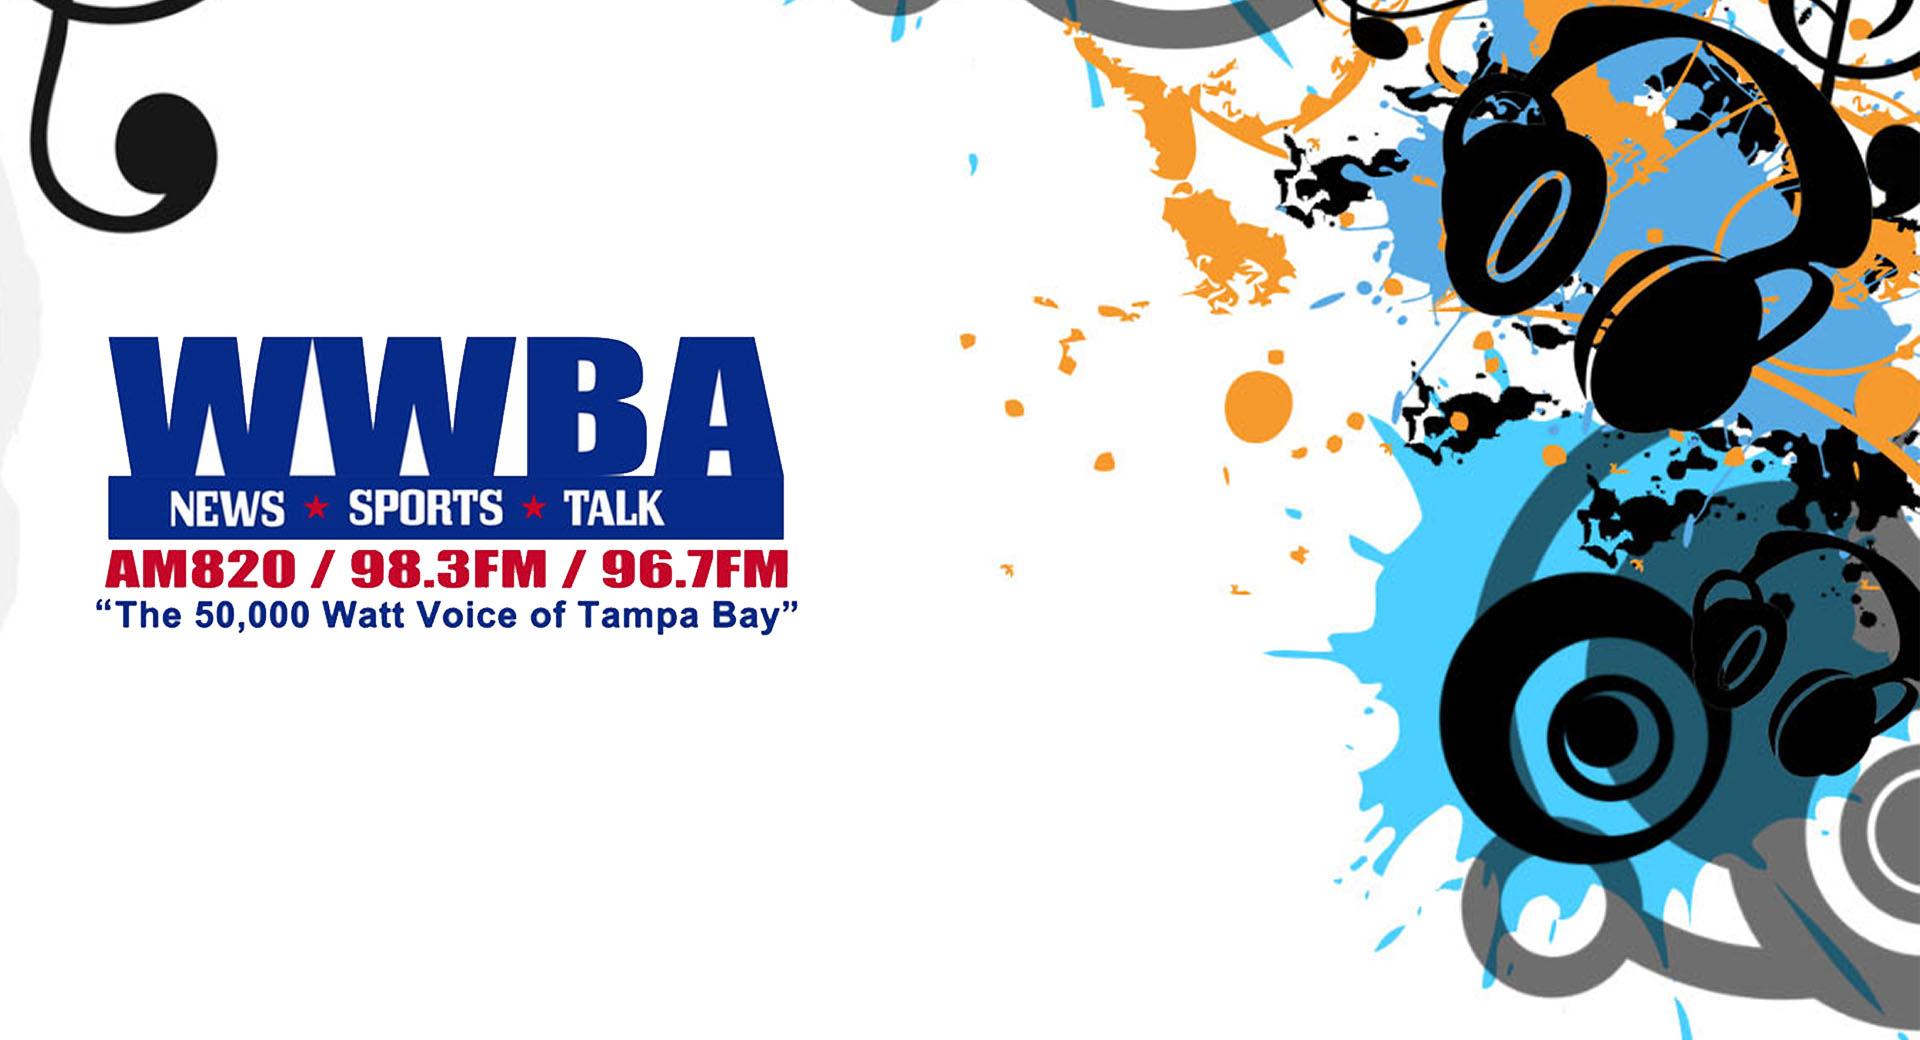 WWBA Radio